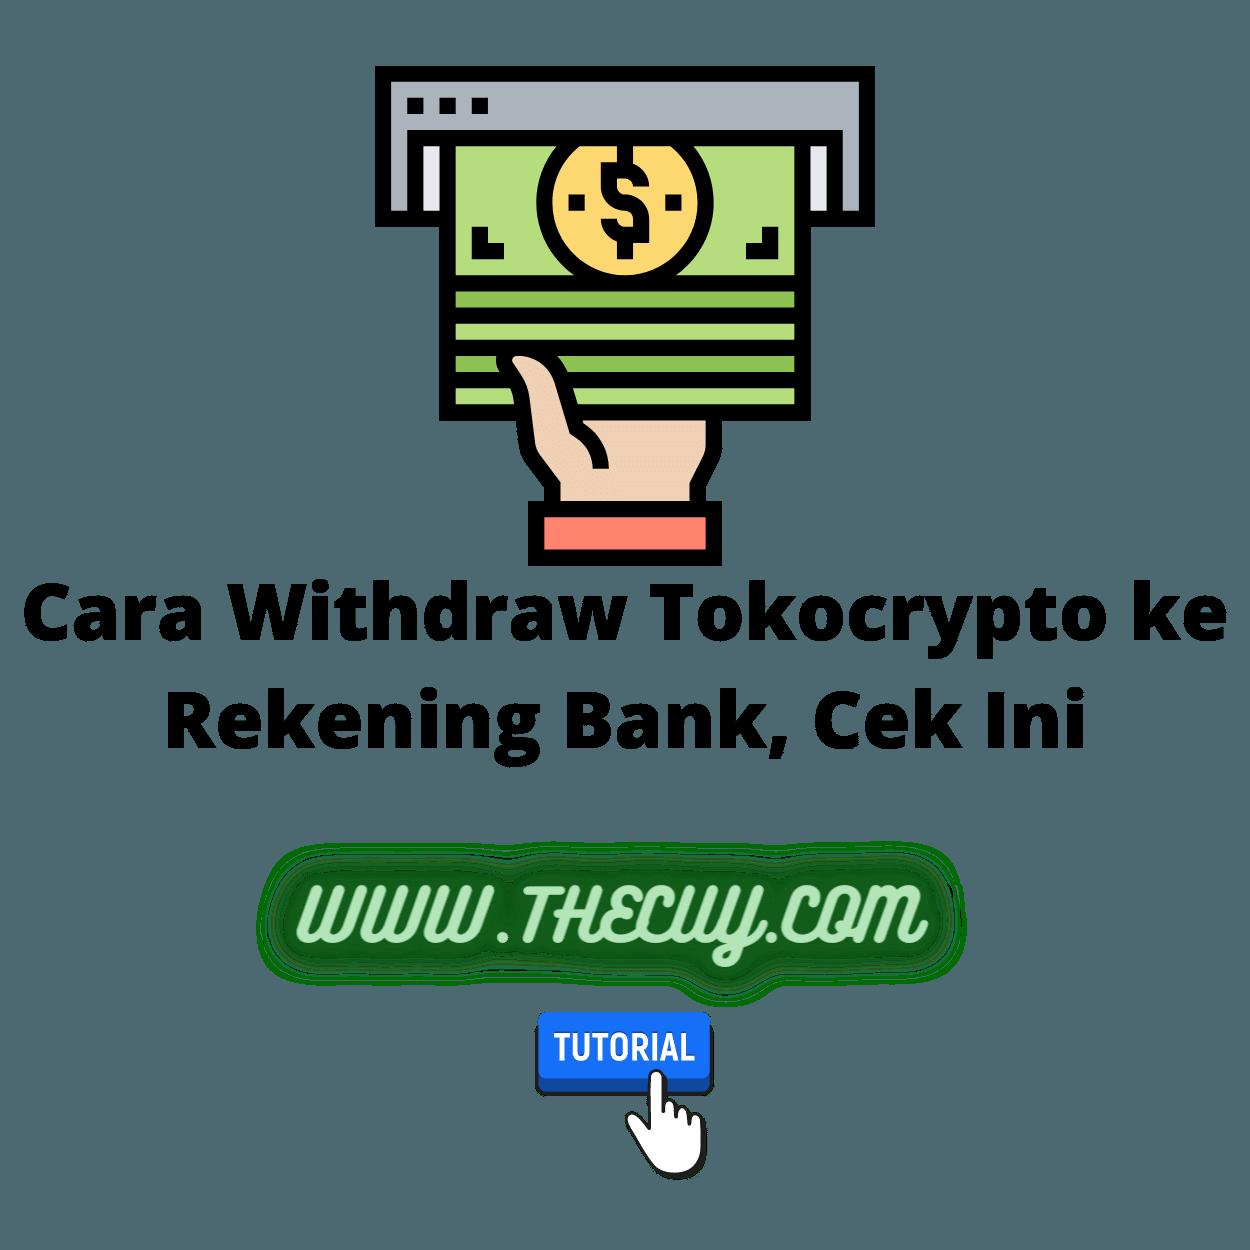 Cara Withdraw Tokocrypto ke Rekening Bank, Cek Ini